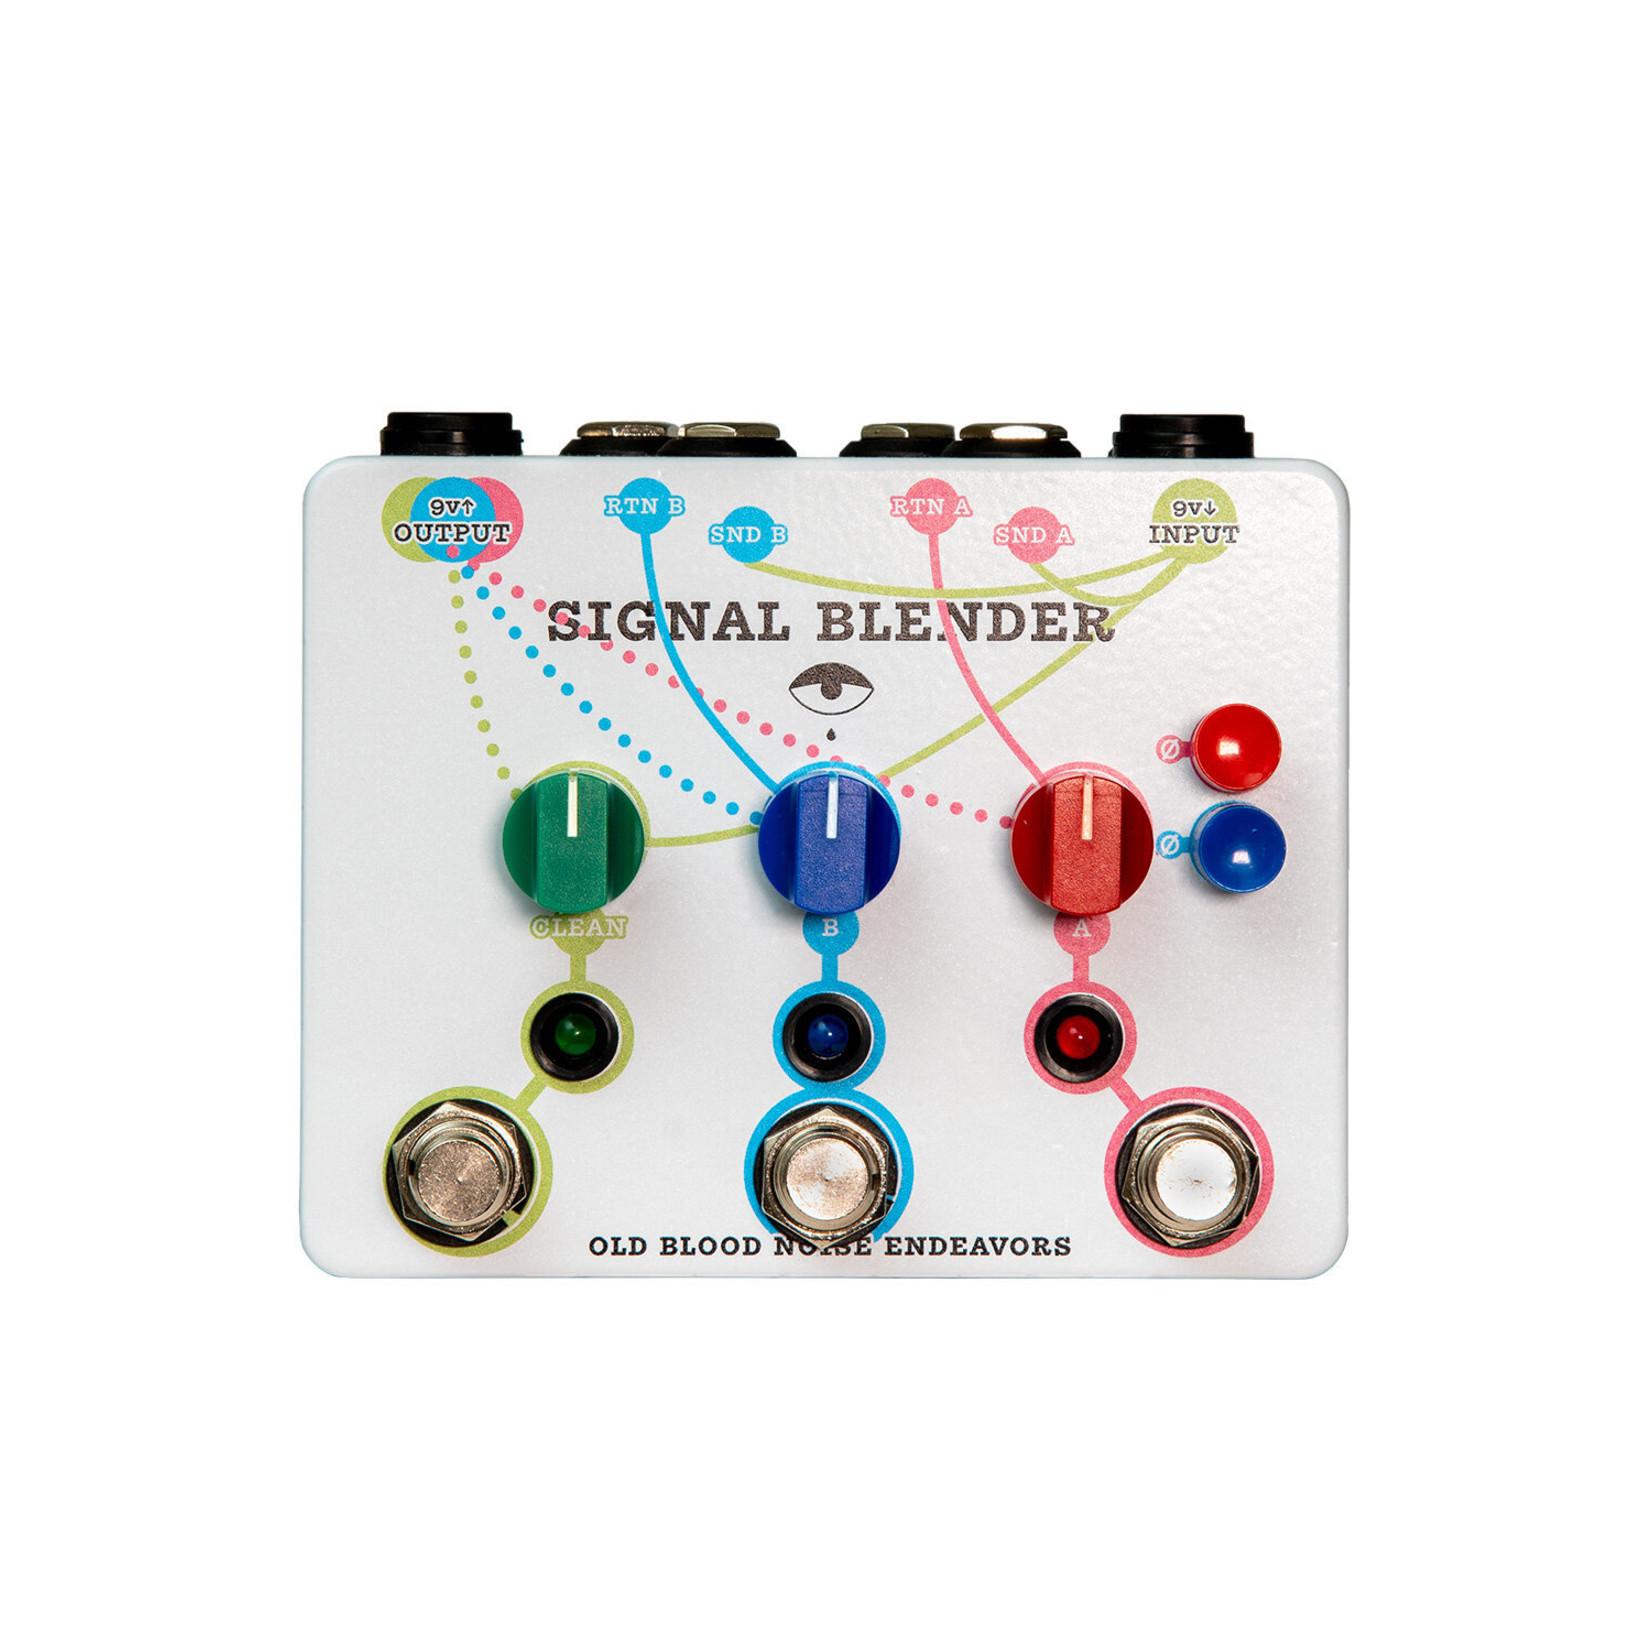 Old Blood Noise Endeavors Old Blood Noise Endeavors Signal Blender